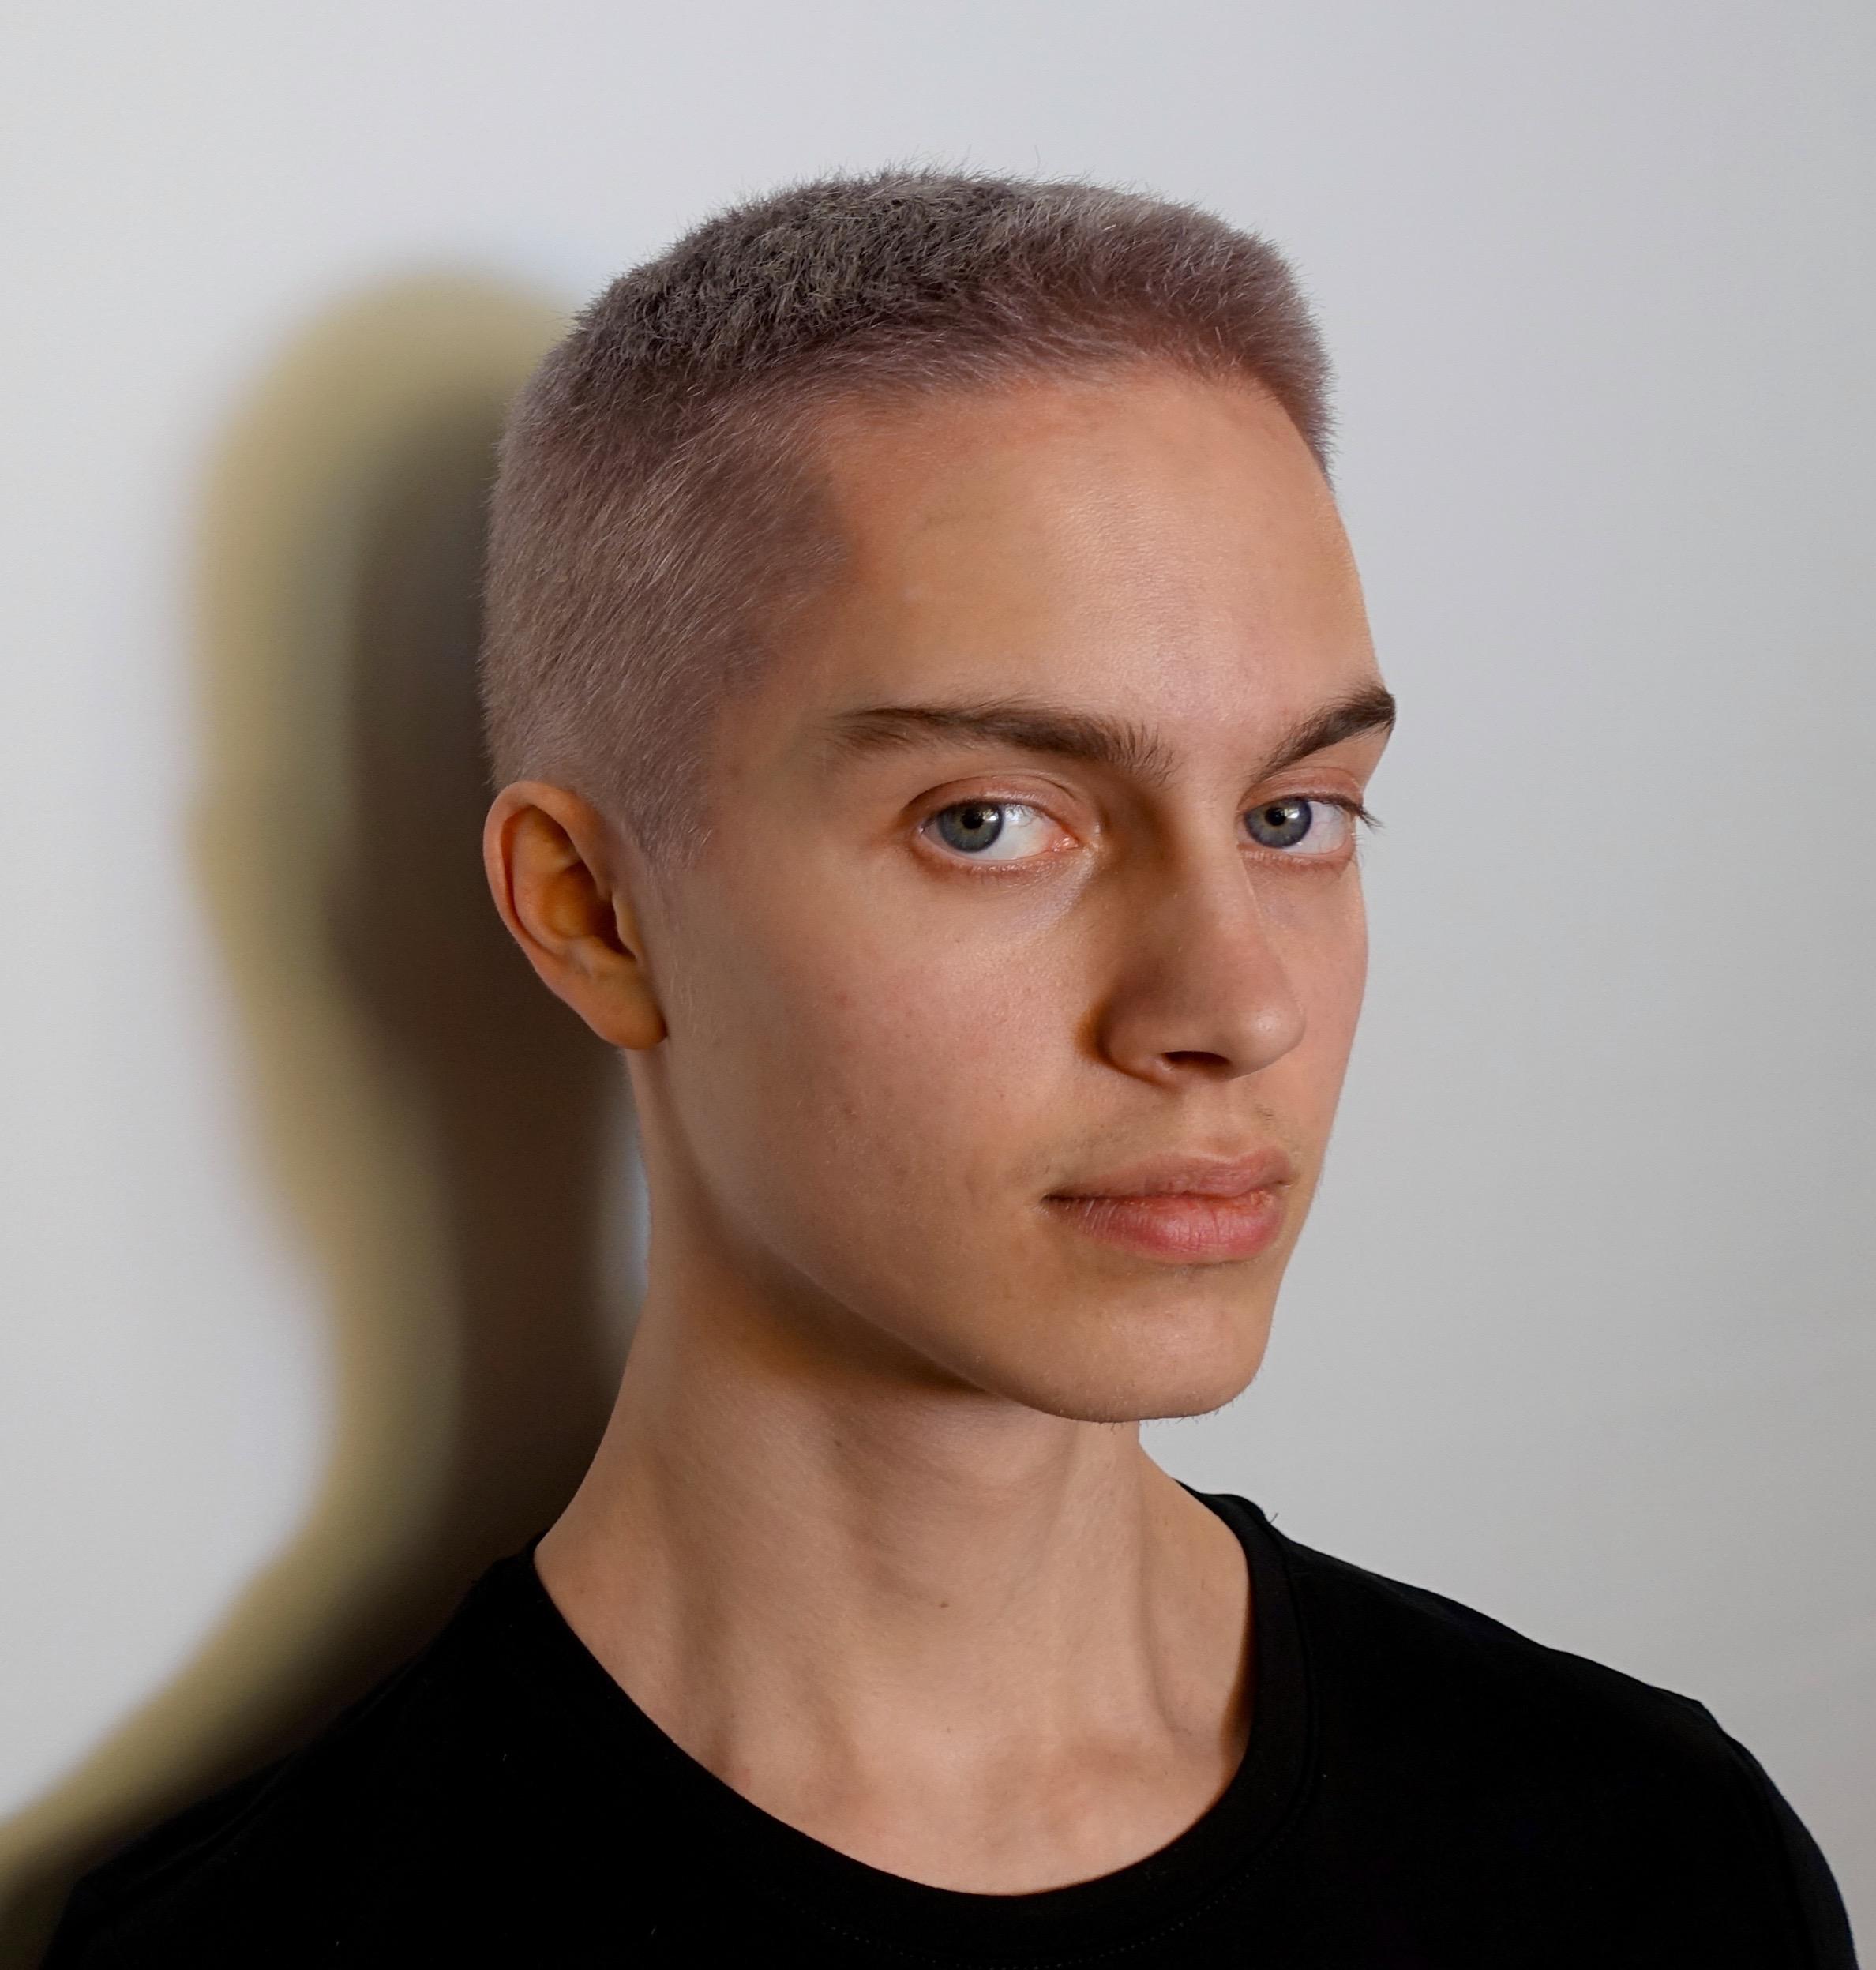 kort hårfrisyre menn